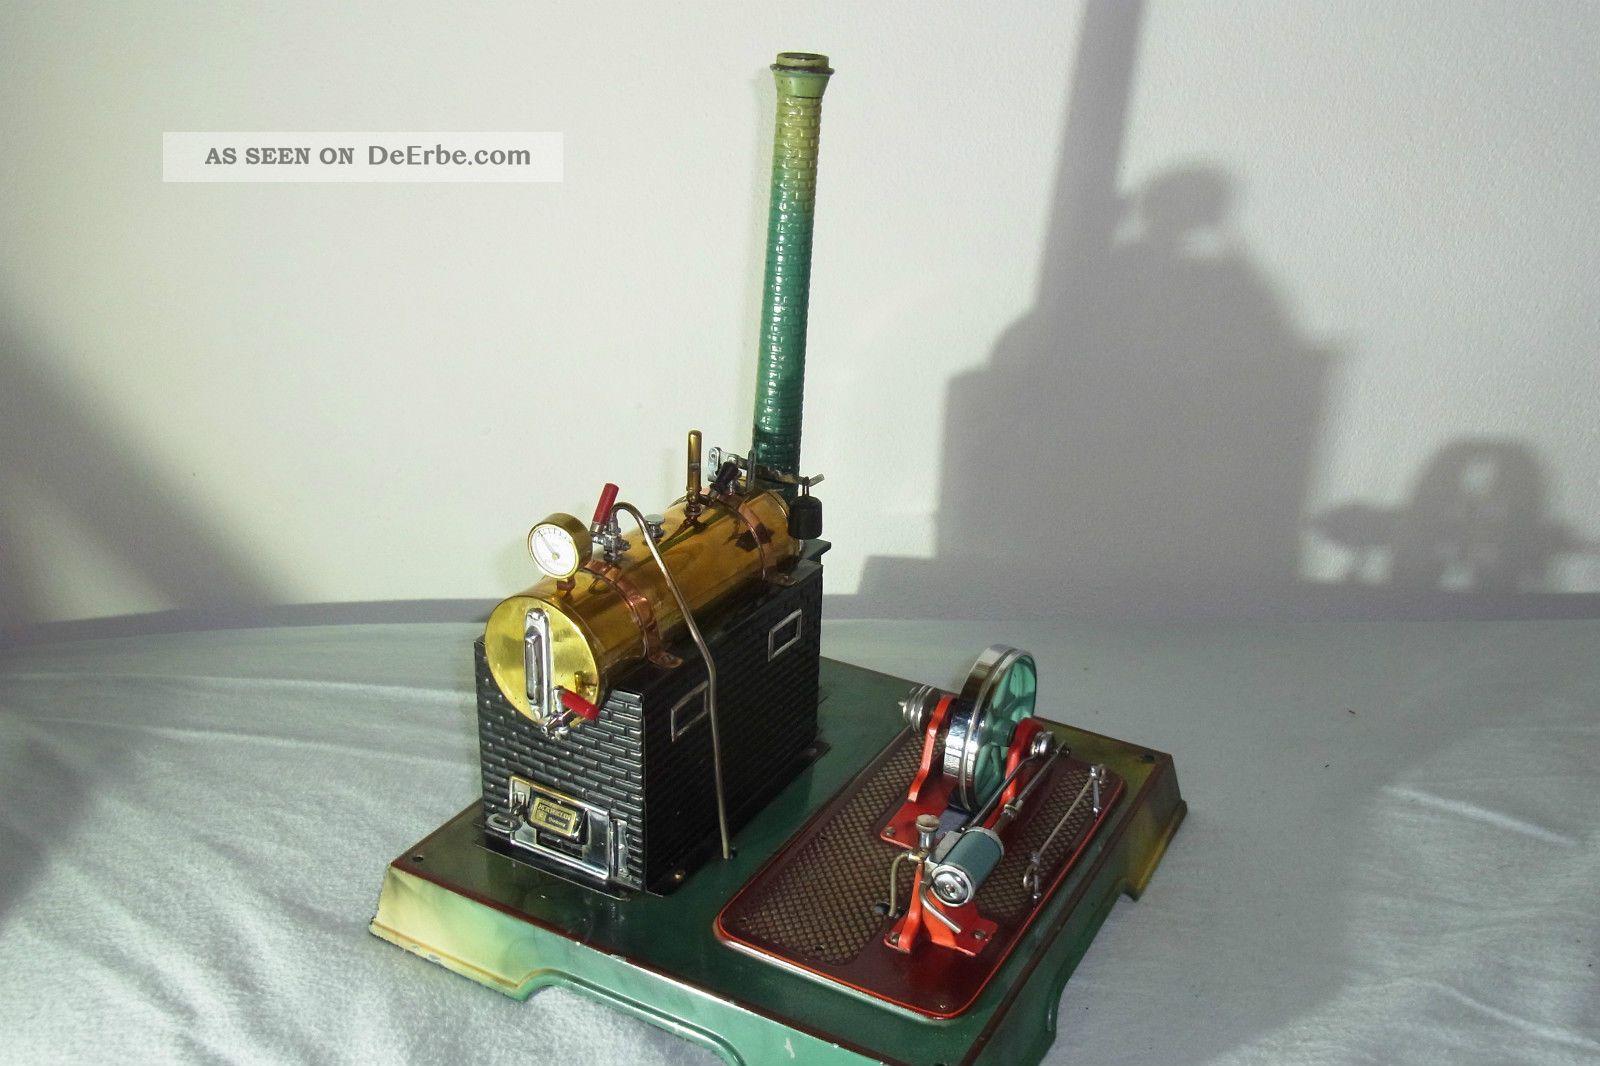 Märklin Dampfmaschine 4097/6 El,  Seltene Rarität Gefertigt vor 1945 Bild